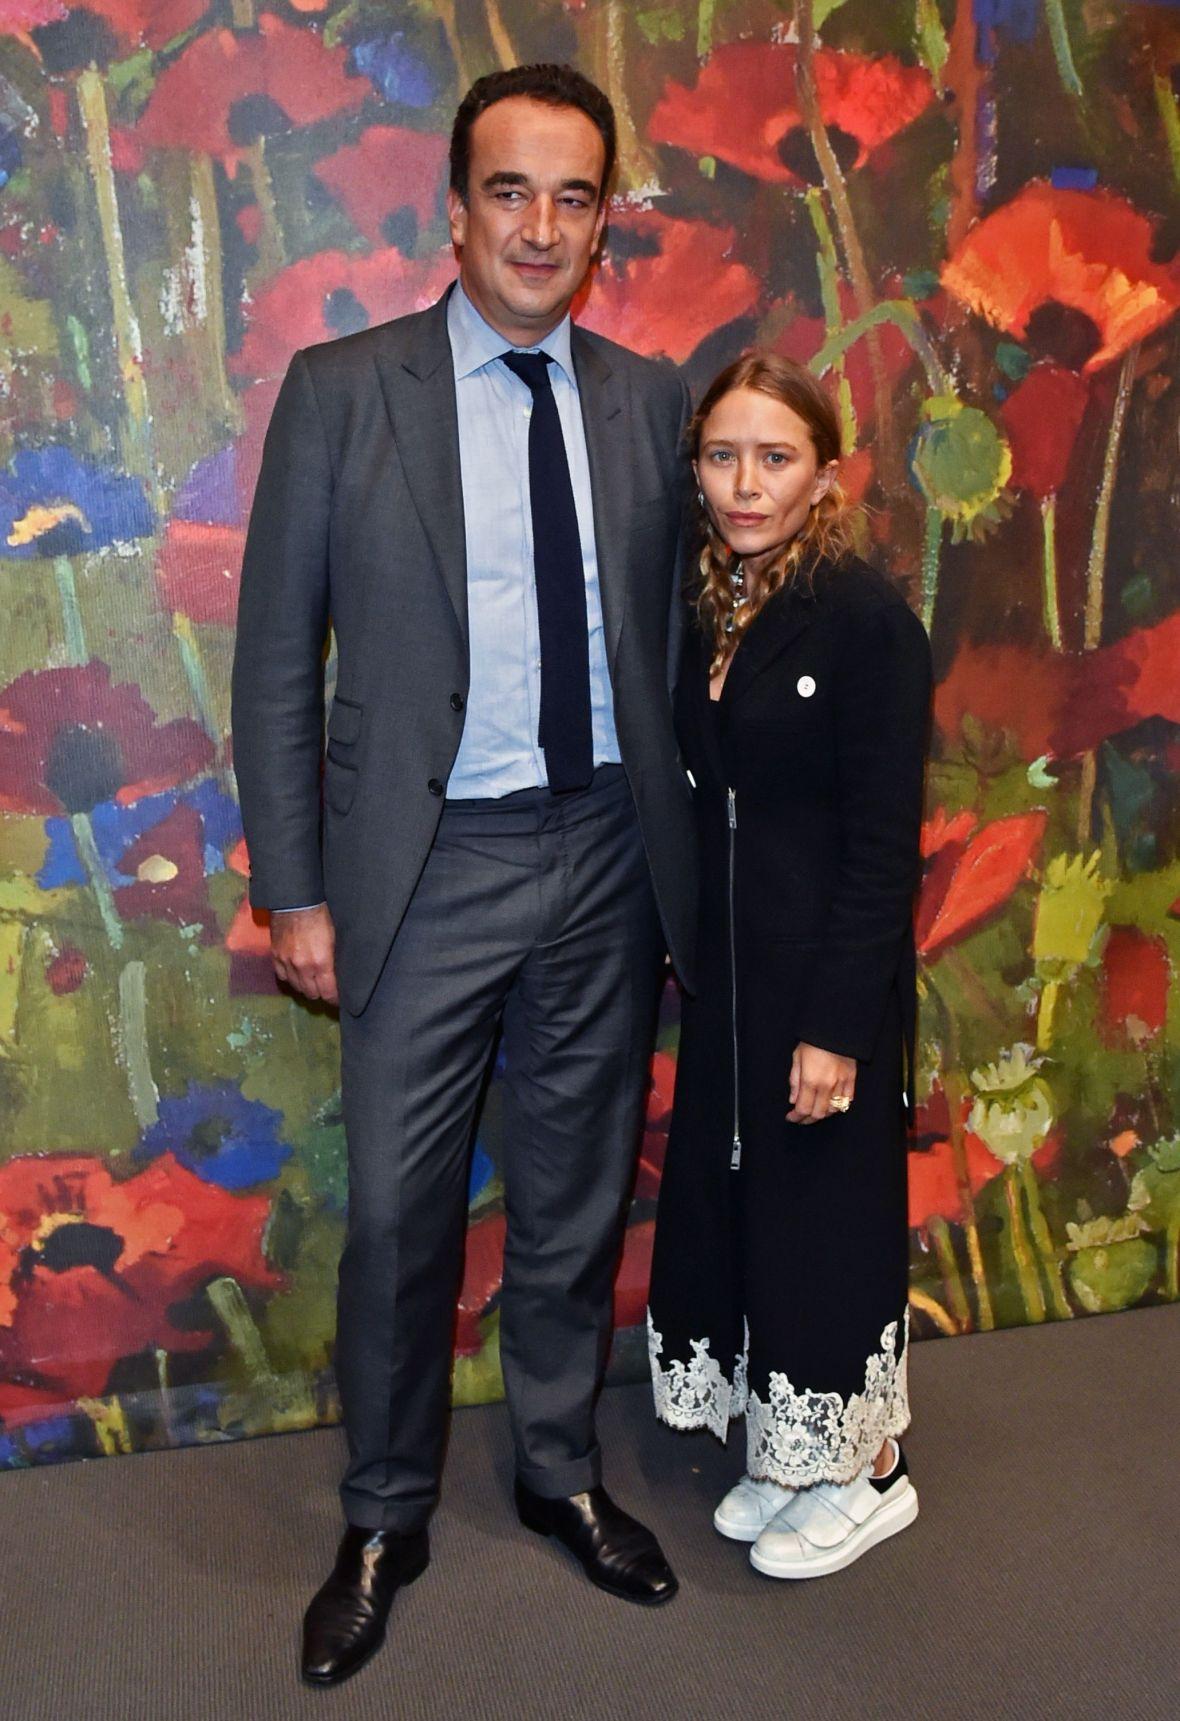 Mary-Kate Olsen and Olivier Sarkozy Divorce